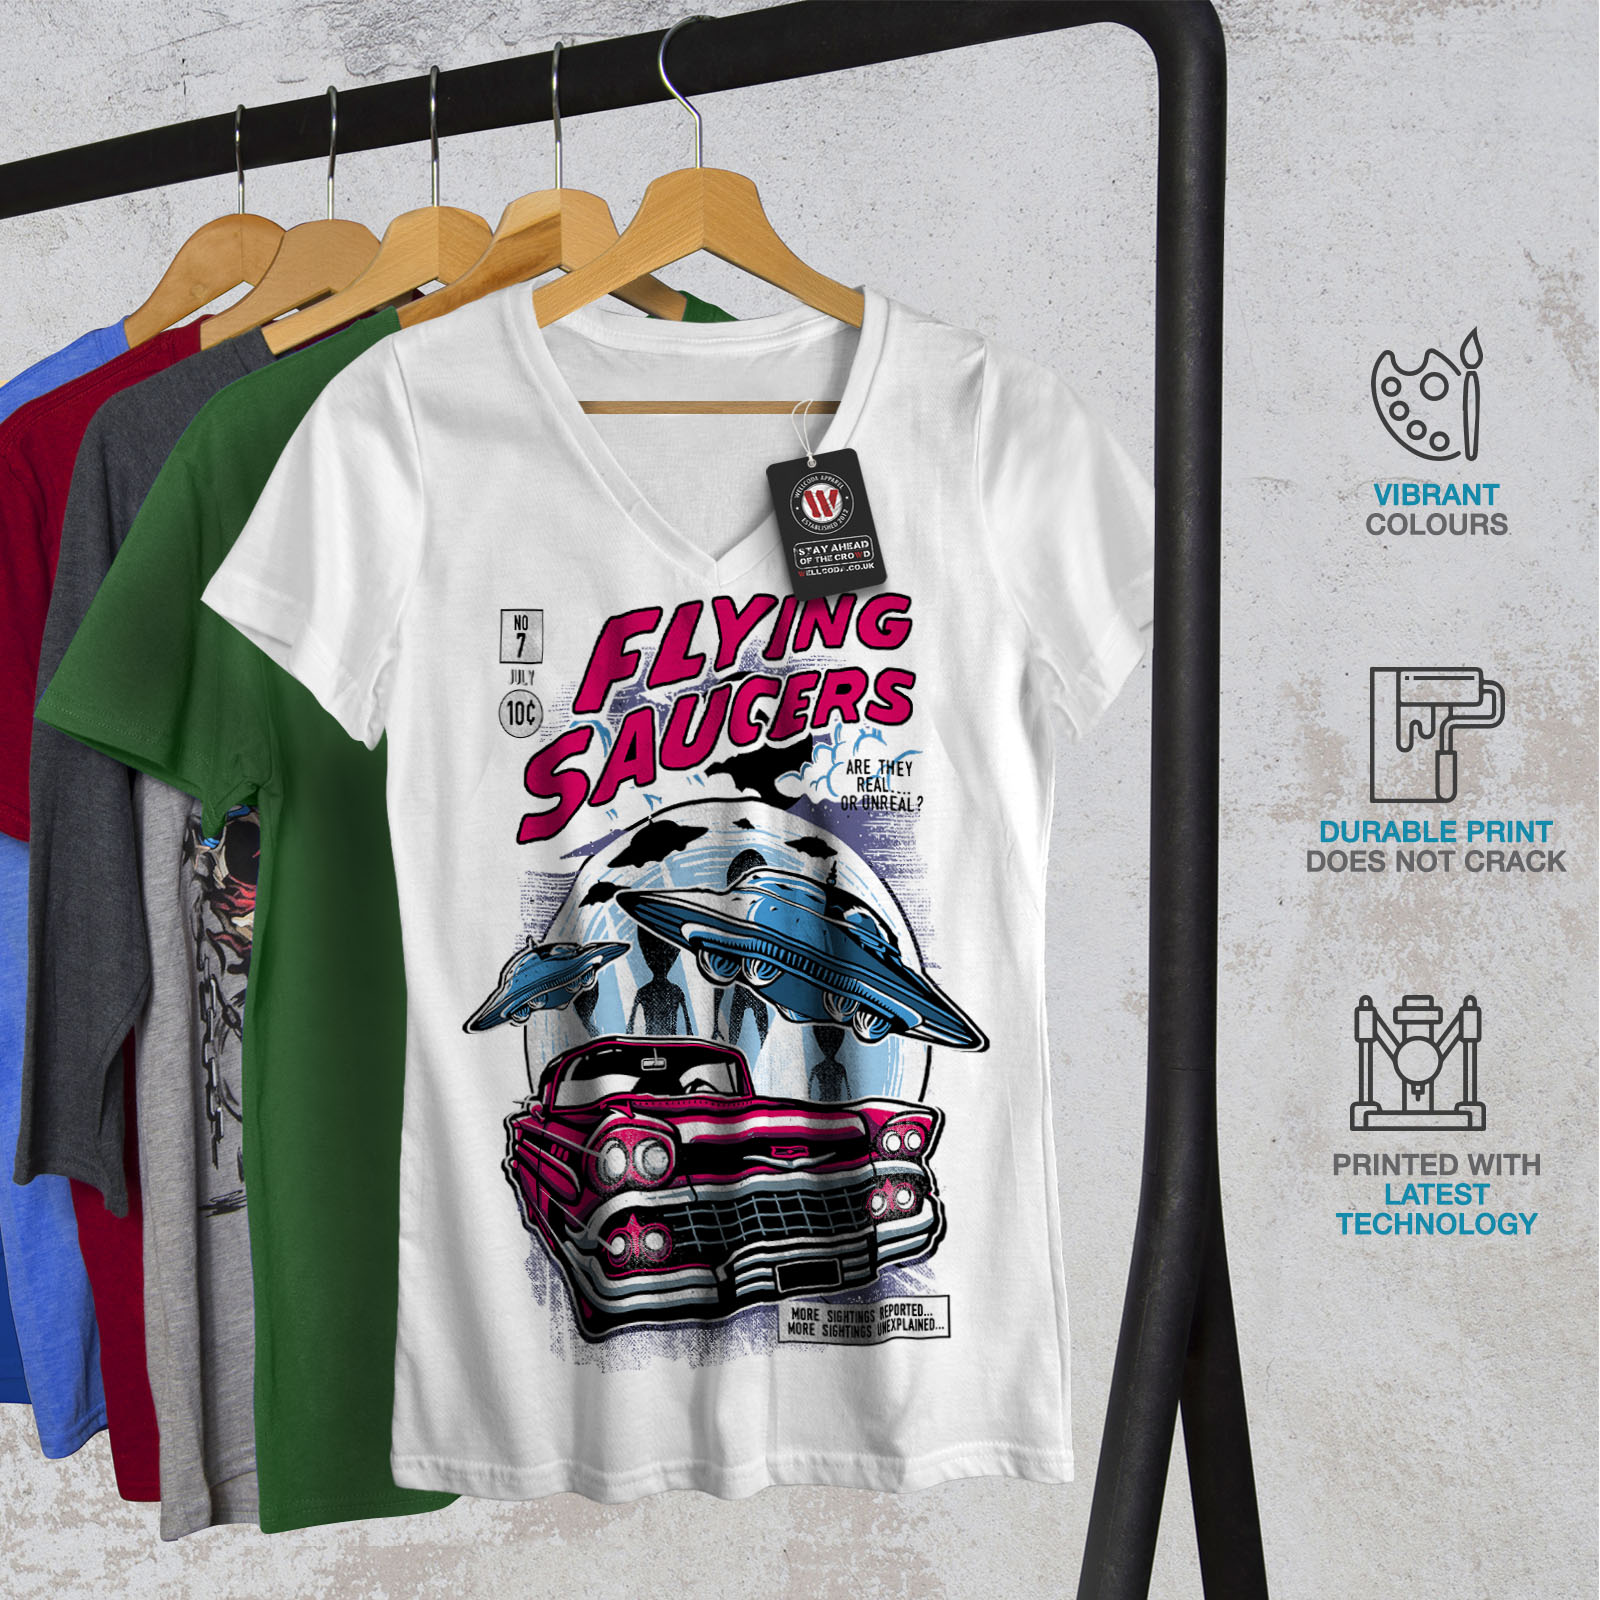 Wellcoda-Flying-Saucers-Fashion-Womens-V-Neck-T-shirt-Graphic-Design-Tee thumbnail 8